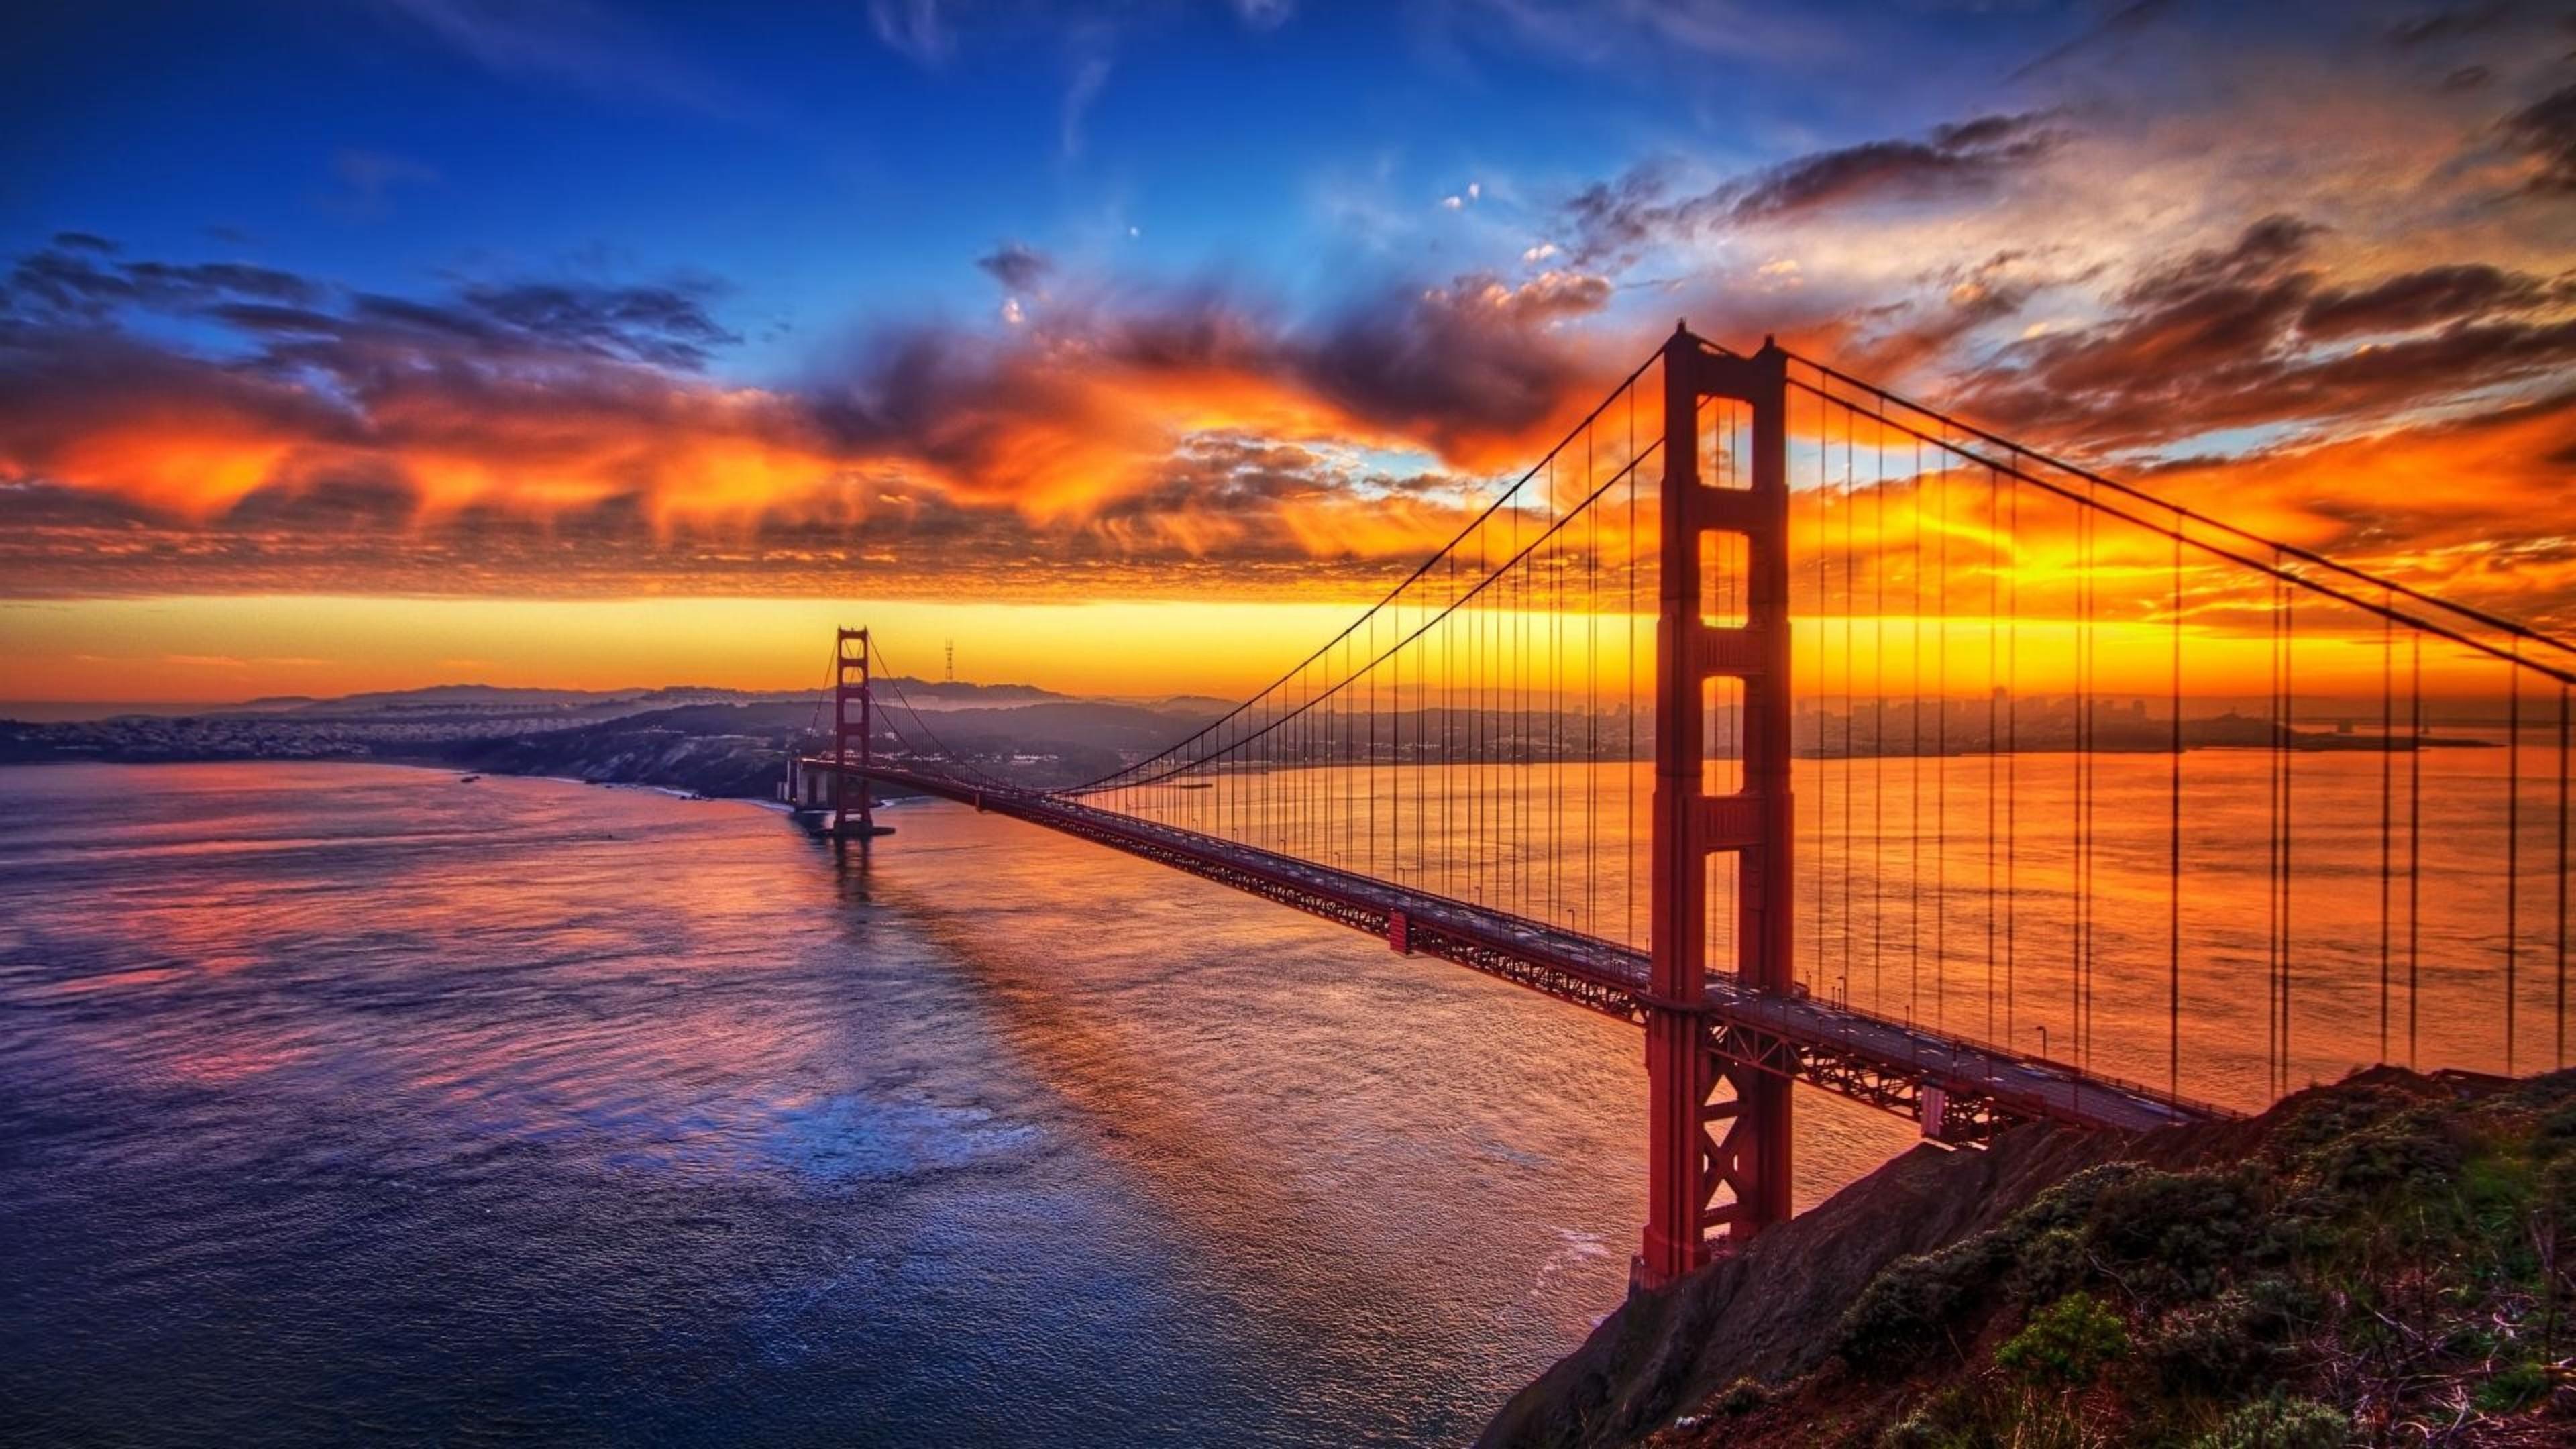 Bridge Sunset Sky, HD Nature, 4k Wallpapers, Images ...